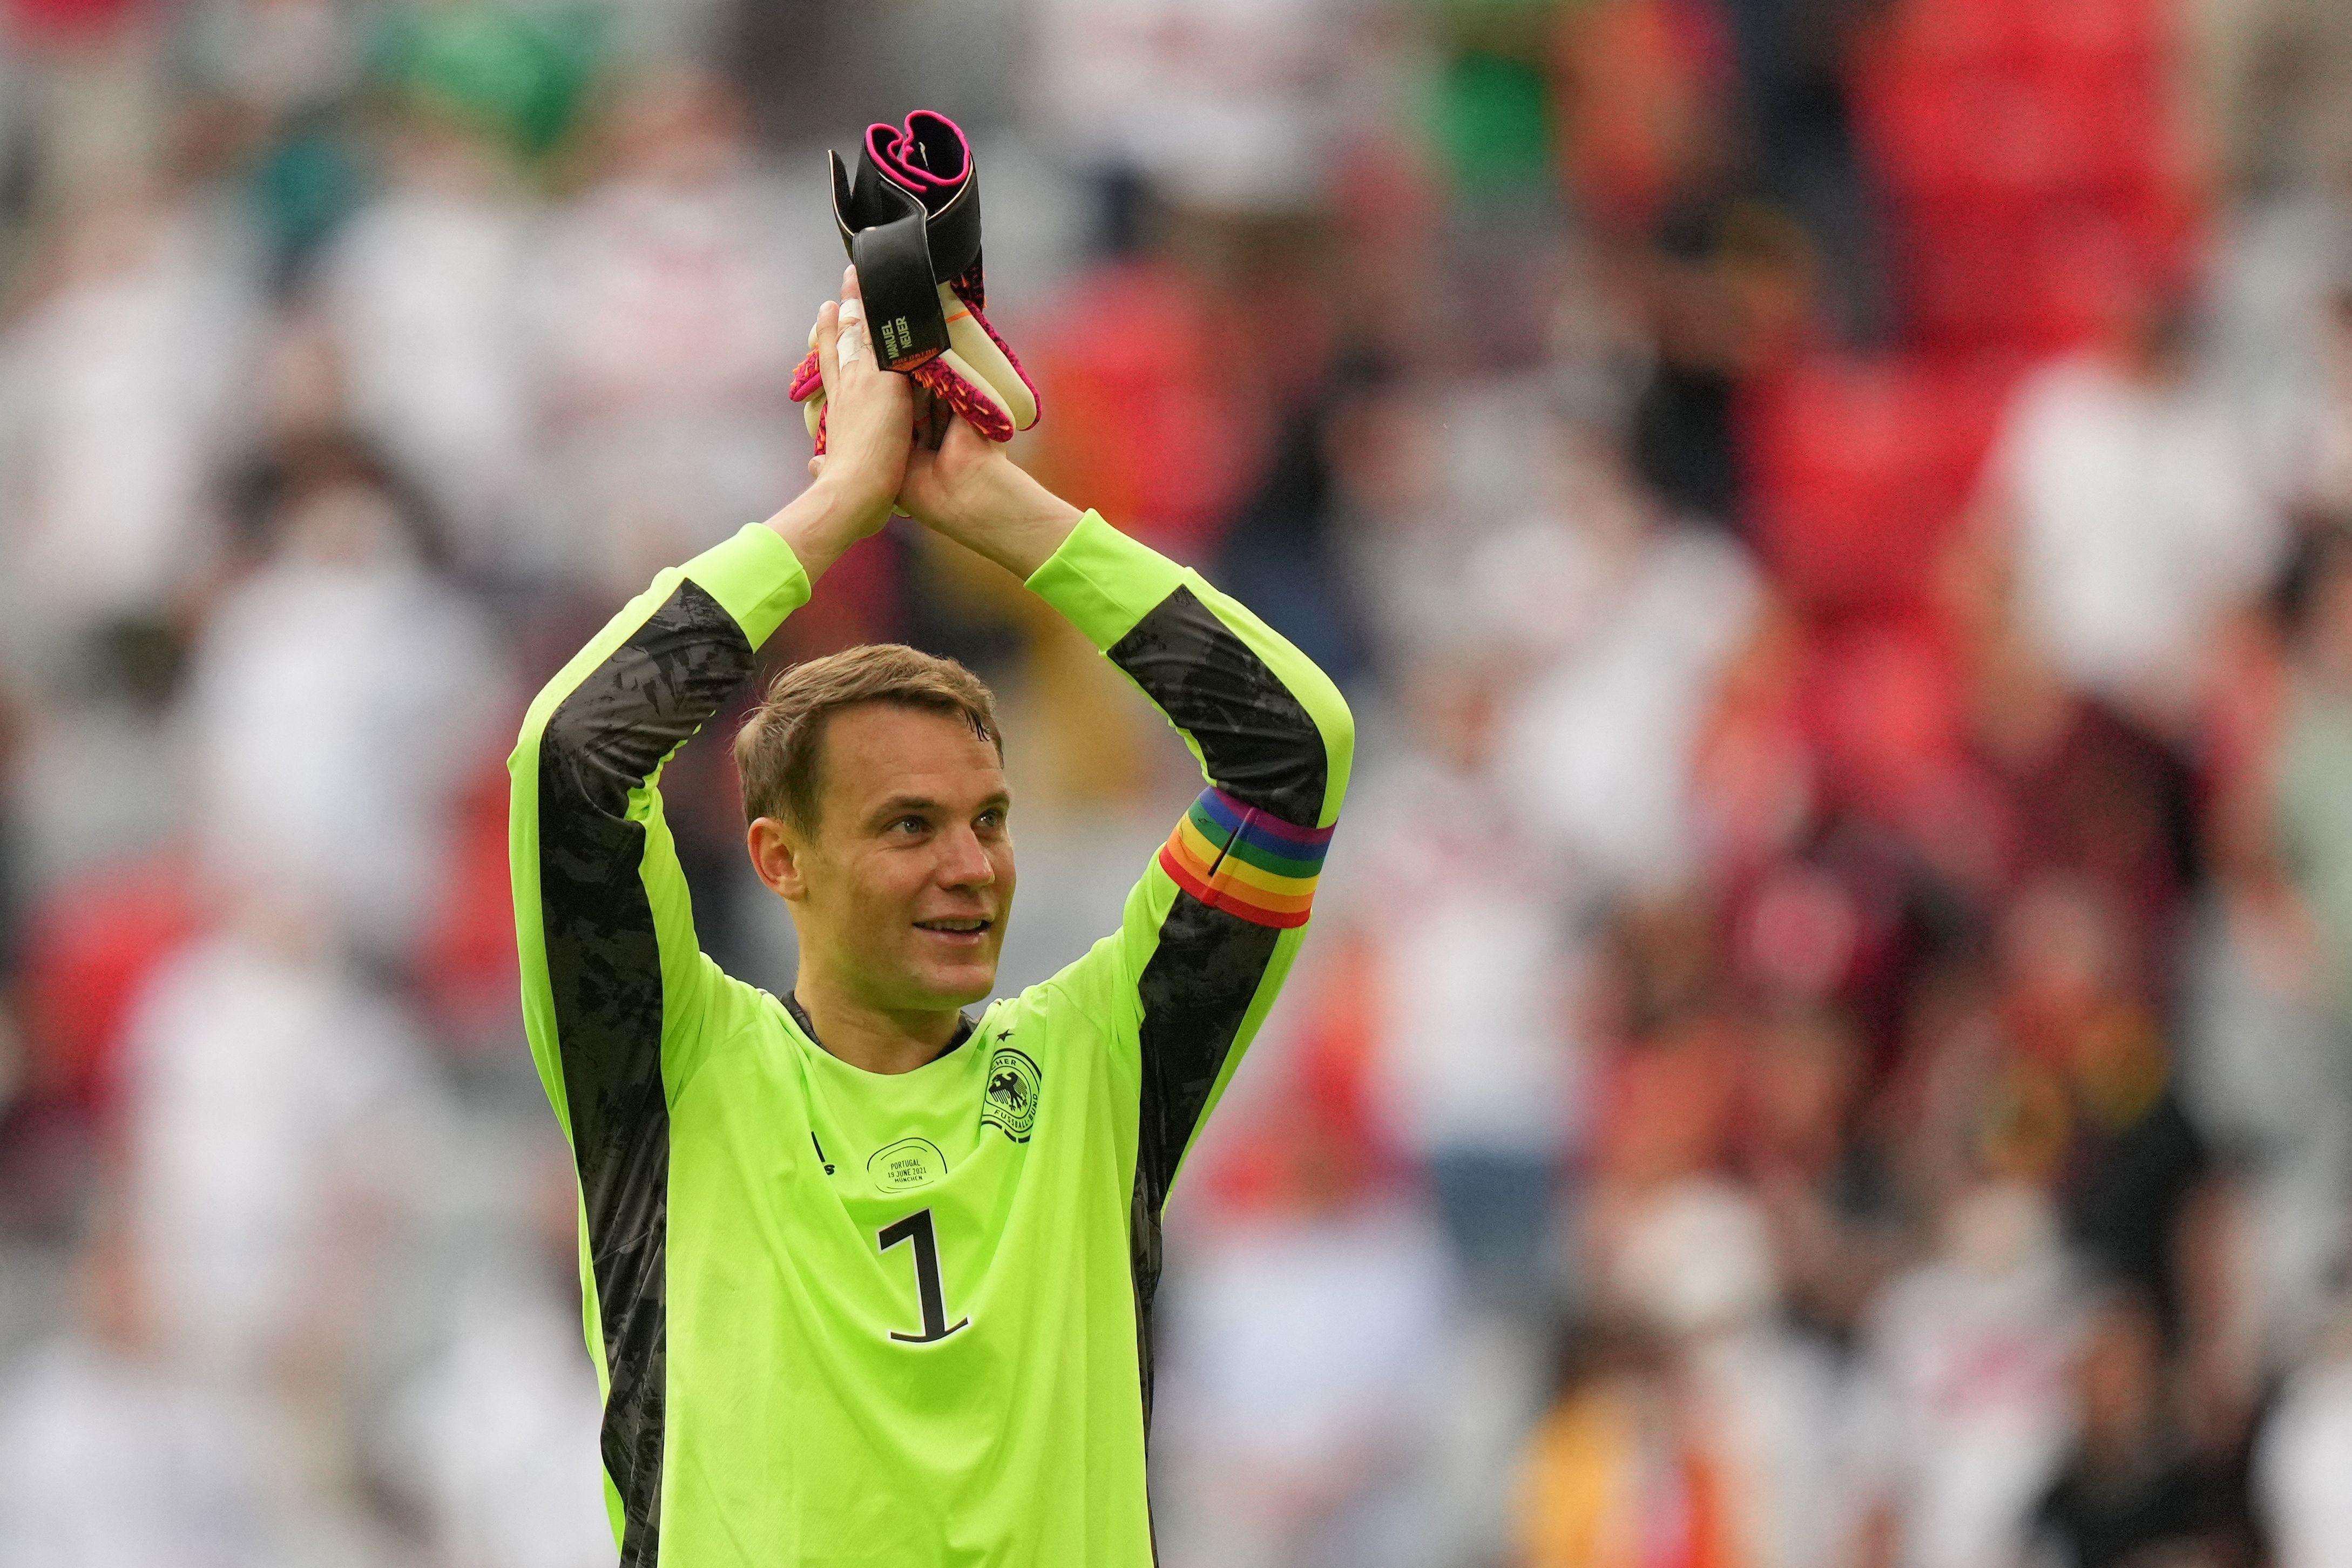 UEFA stops investigation into German keeper Manuel Neuer's rainbow armband, calling it 'good cause'